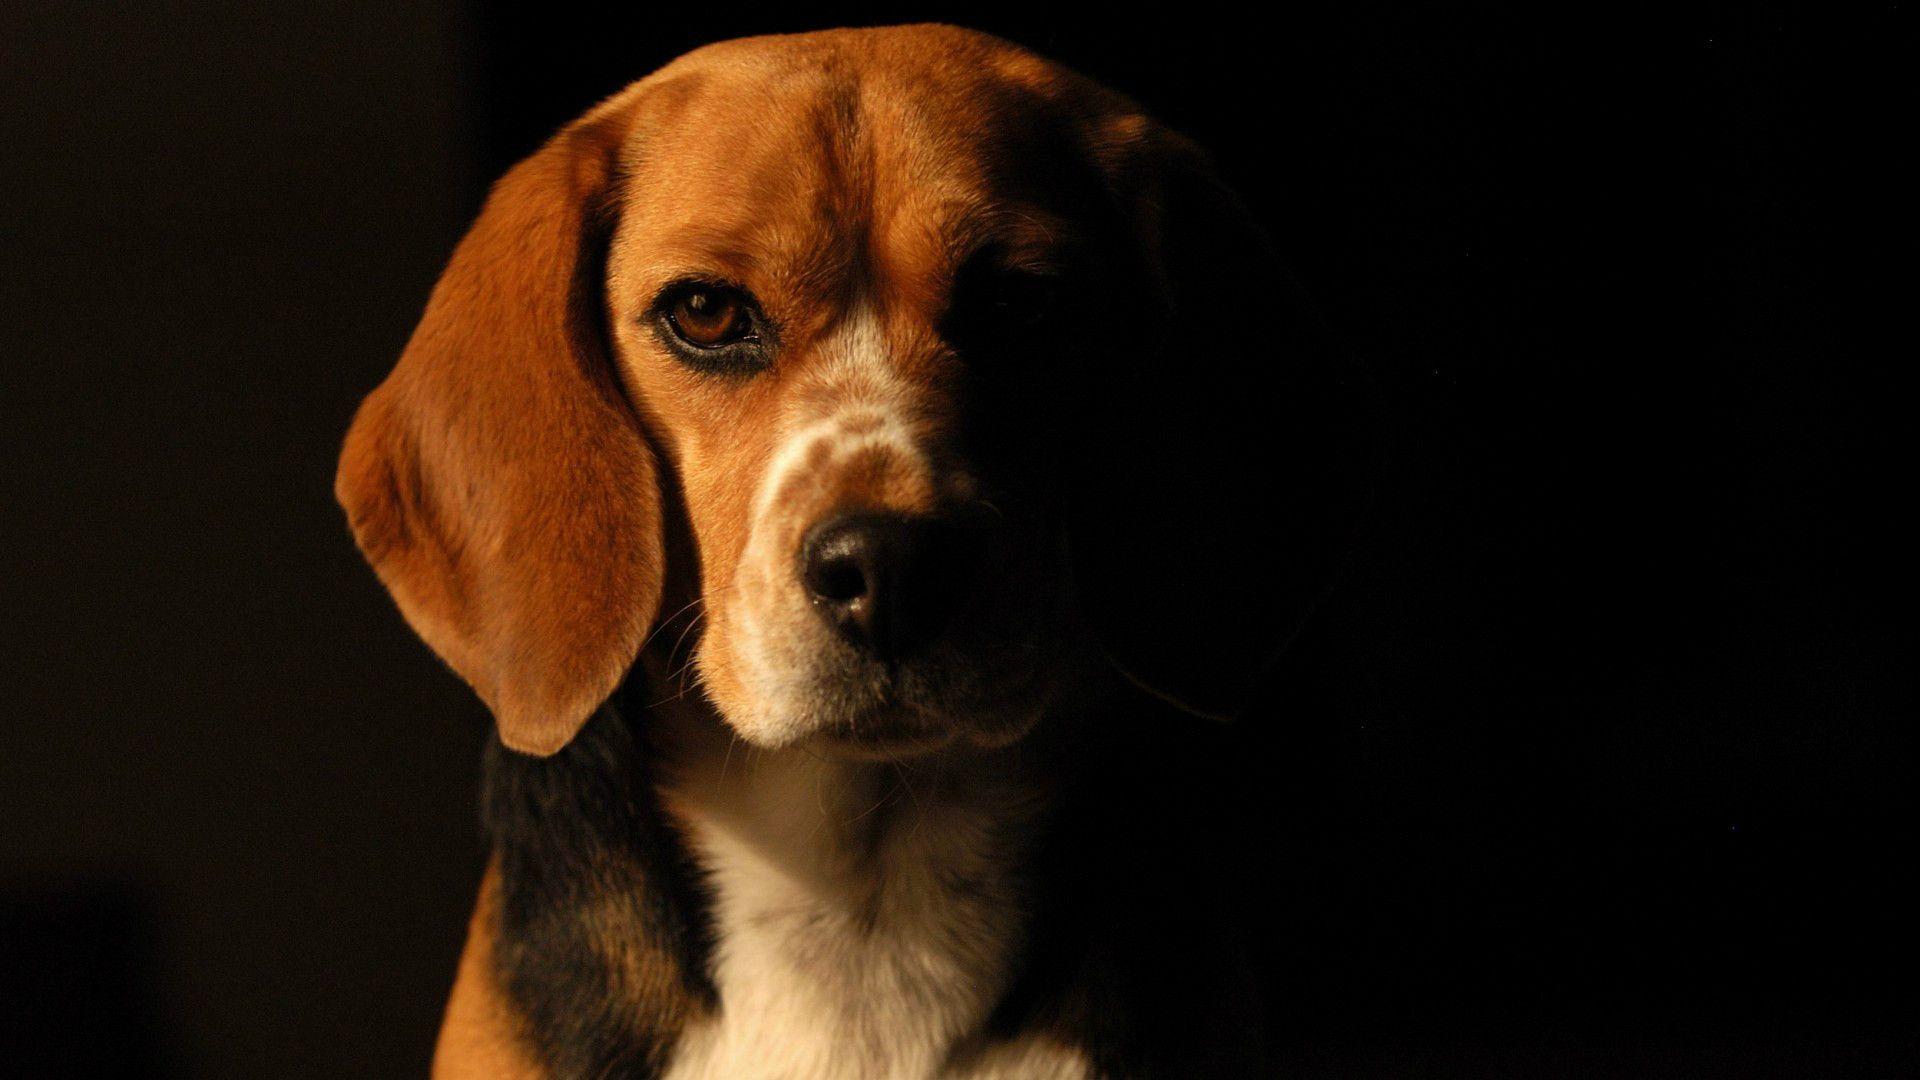 Cute Wallpapers 1080p Beagles Beagle Hd Wallpaper Pixelstalk Net